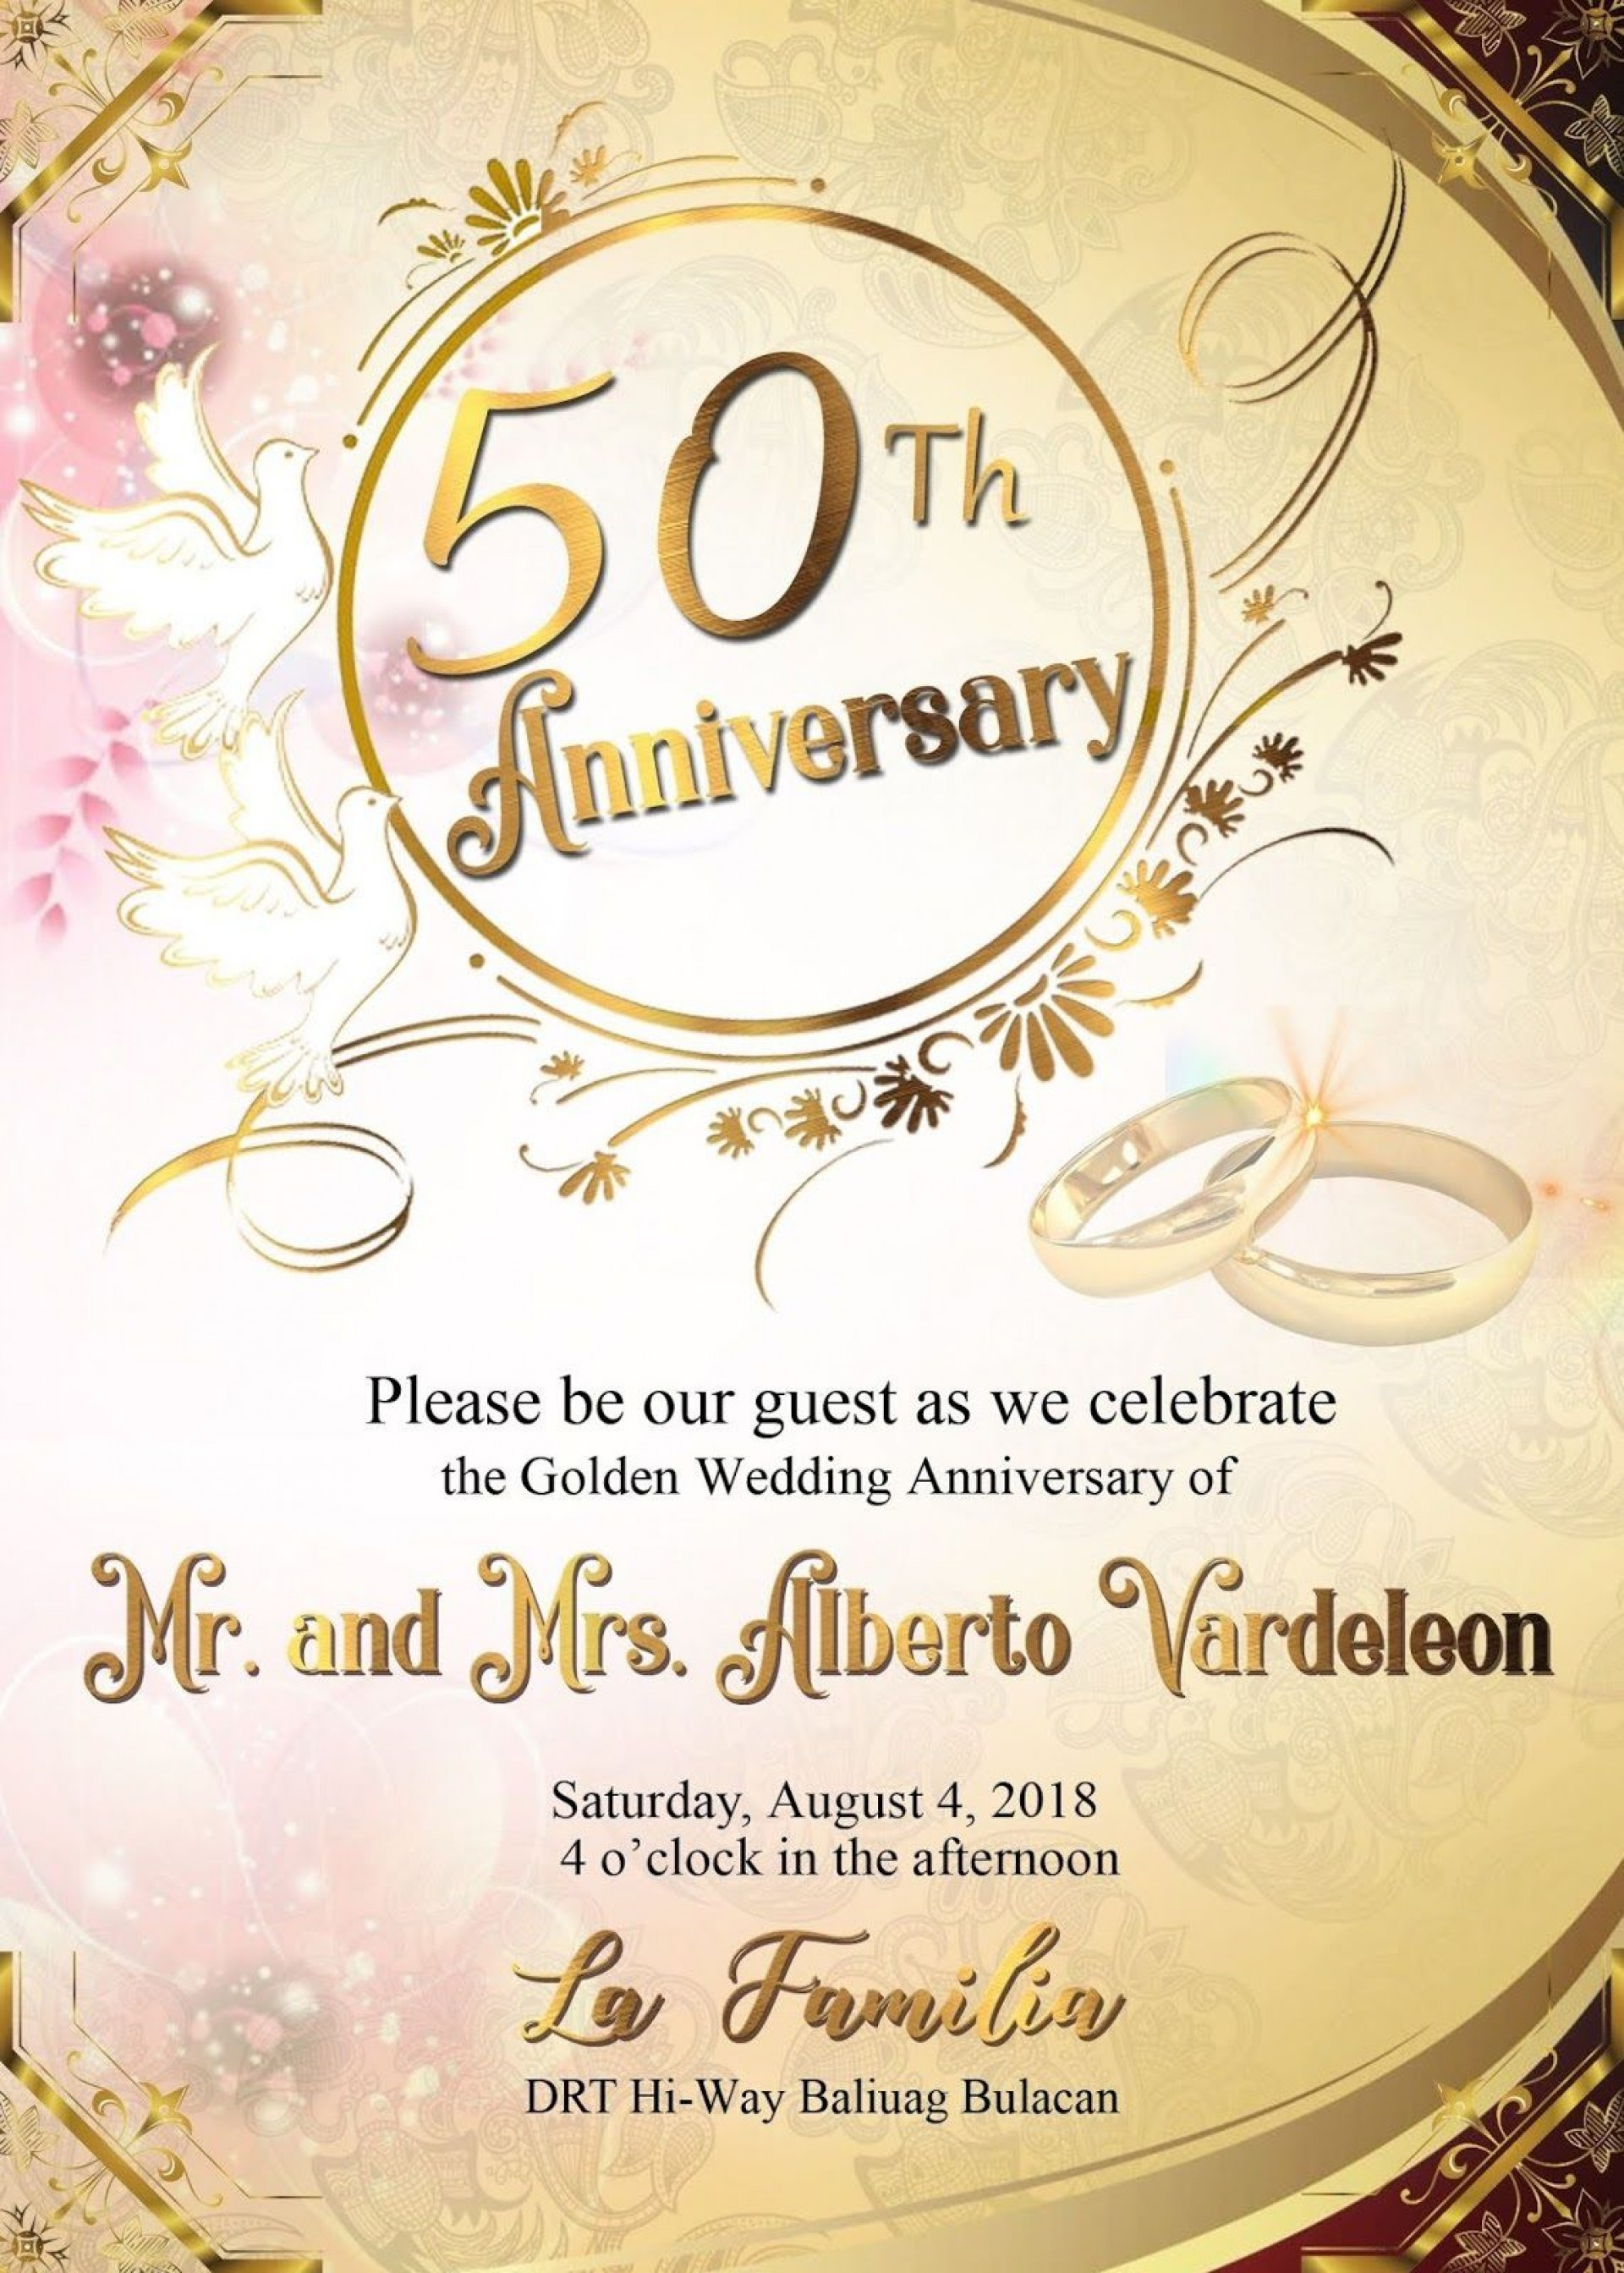 008 Impressive 50th Wedding Anniversary Invitation Template Concept  Templates Card Sample Golden1920